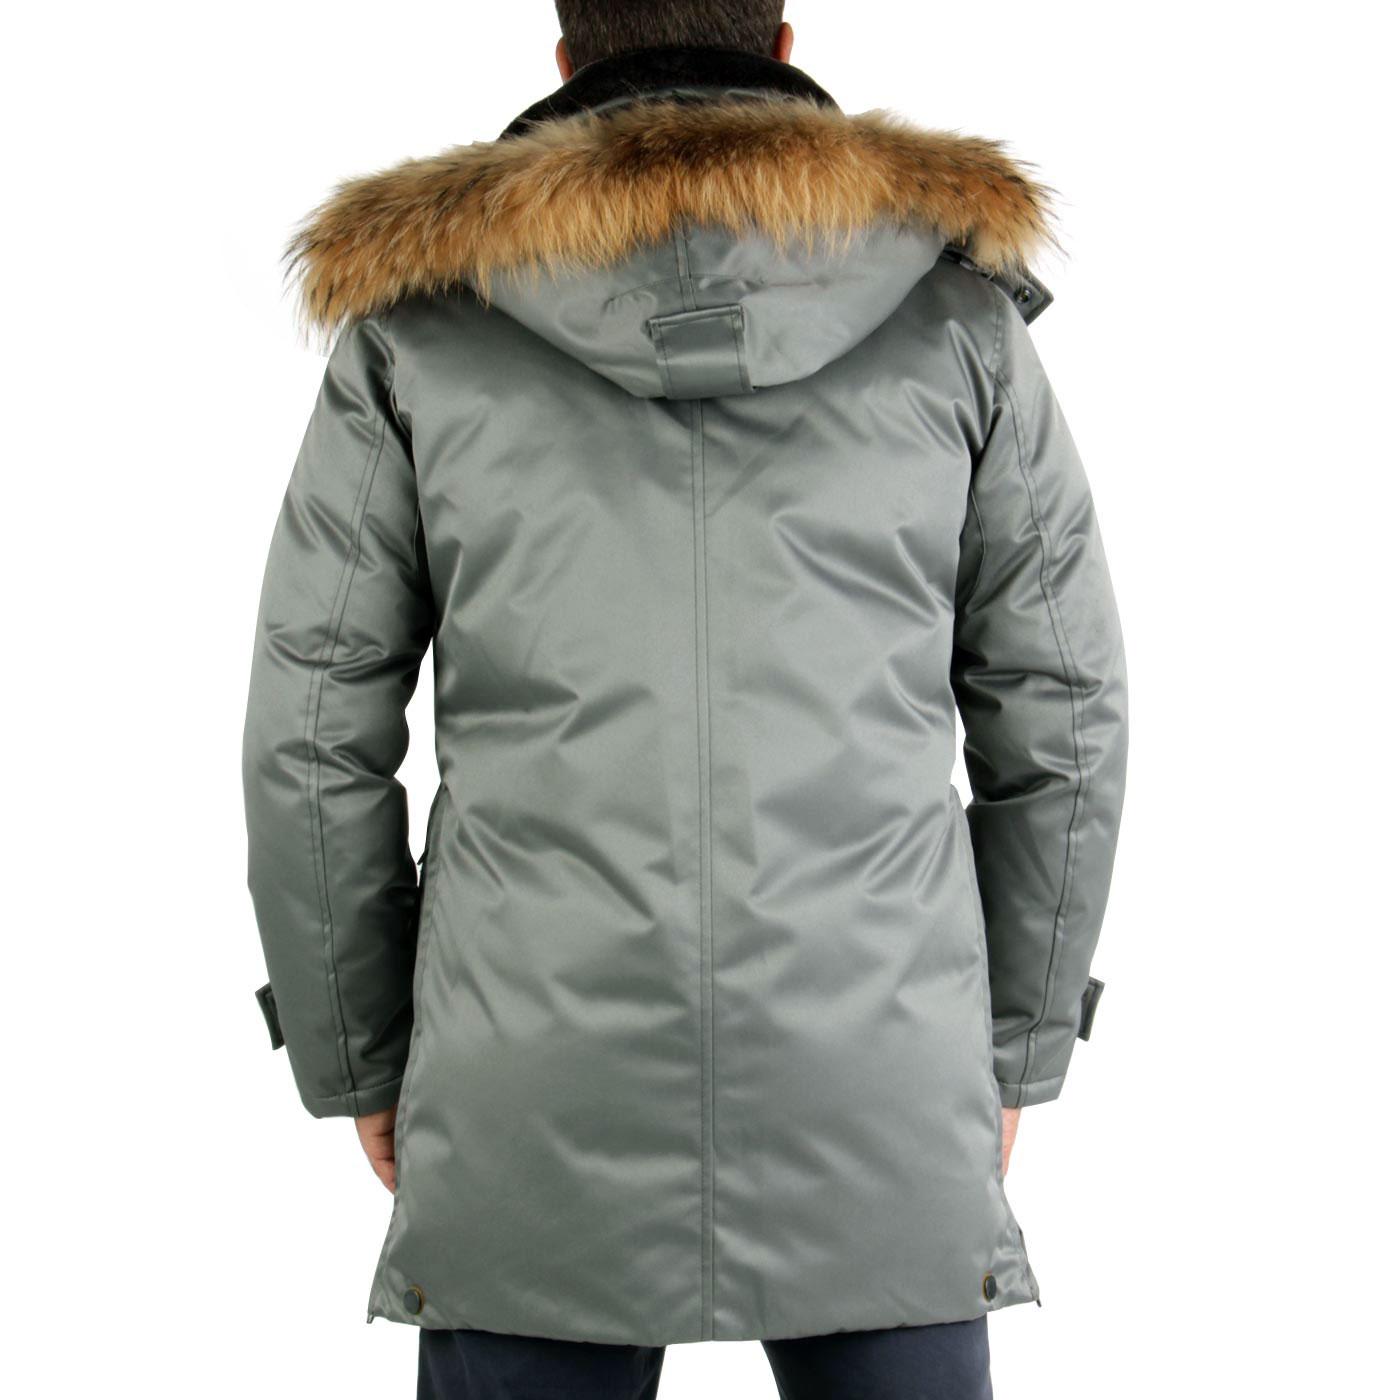 blauer usa herren winter daunen parka mantel jacke grey. Black Bedroom Furniture Sets. Home Design Ideas